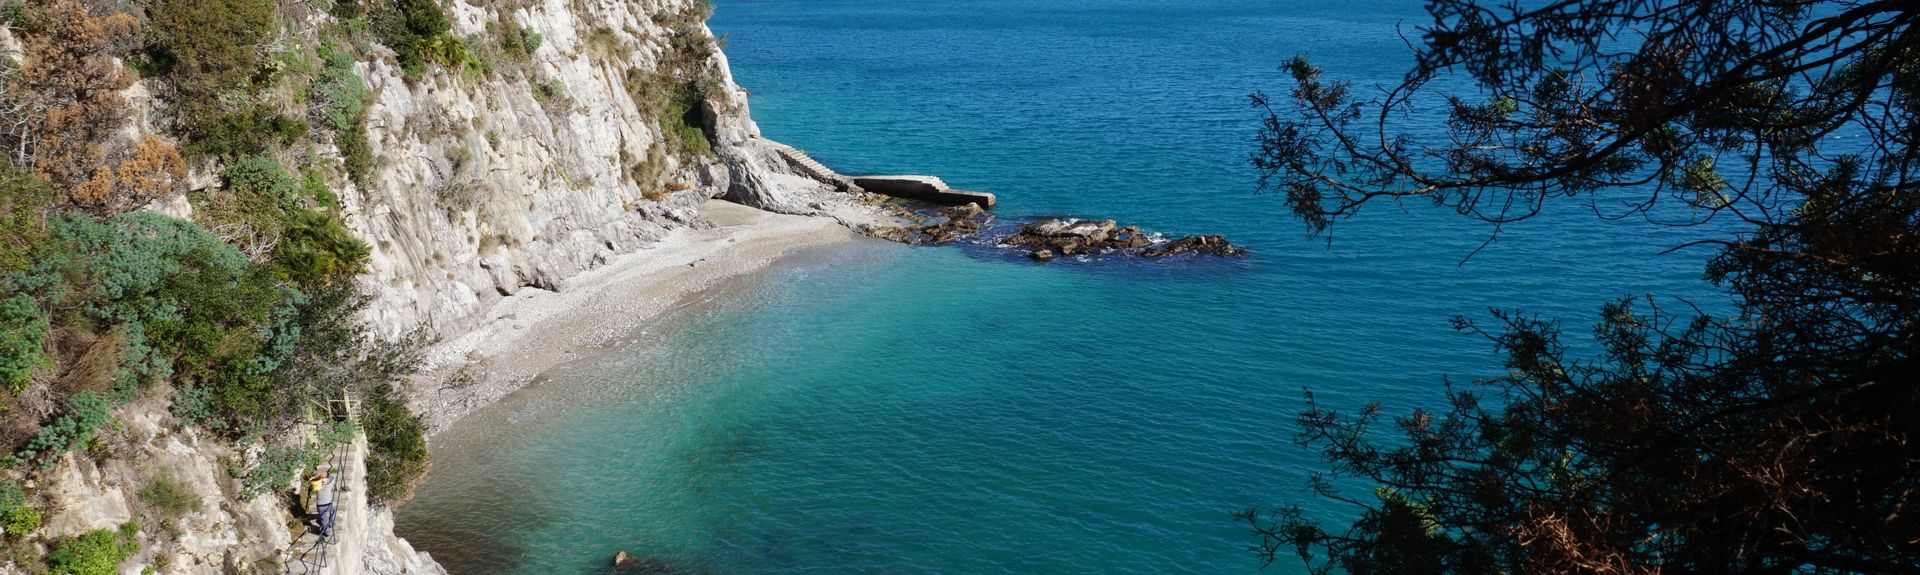 Praiano, Campanie, Italie